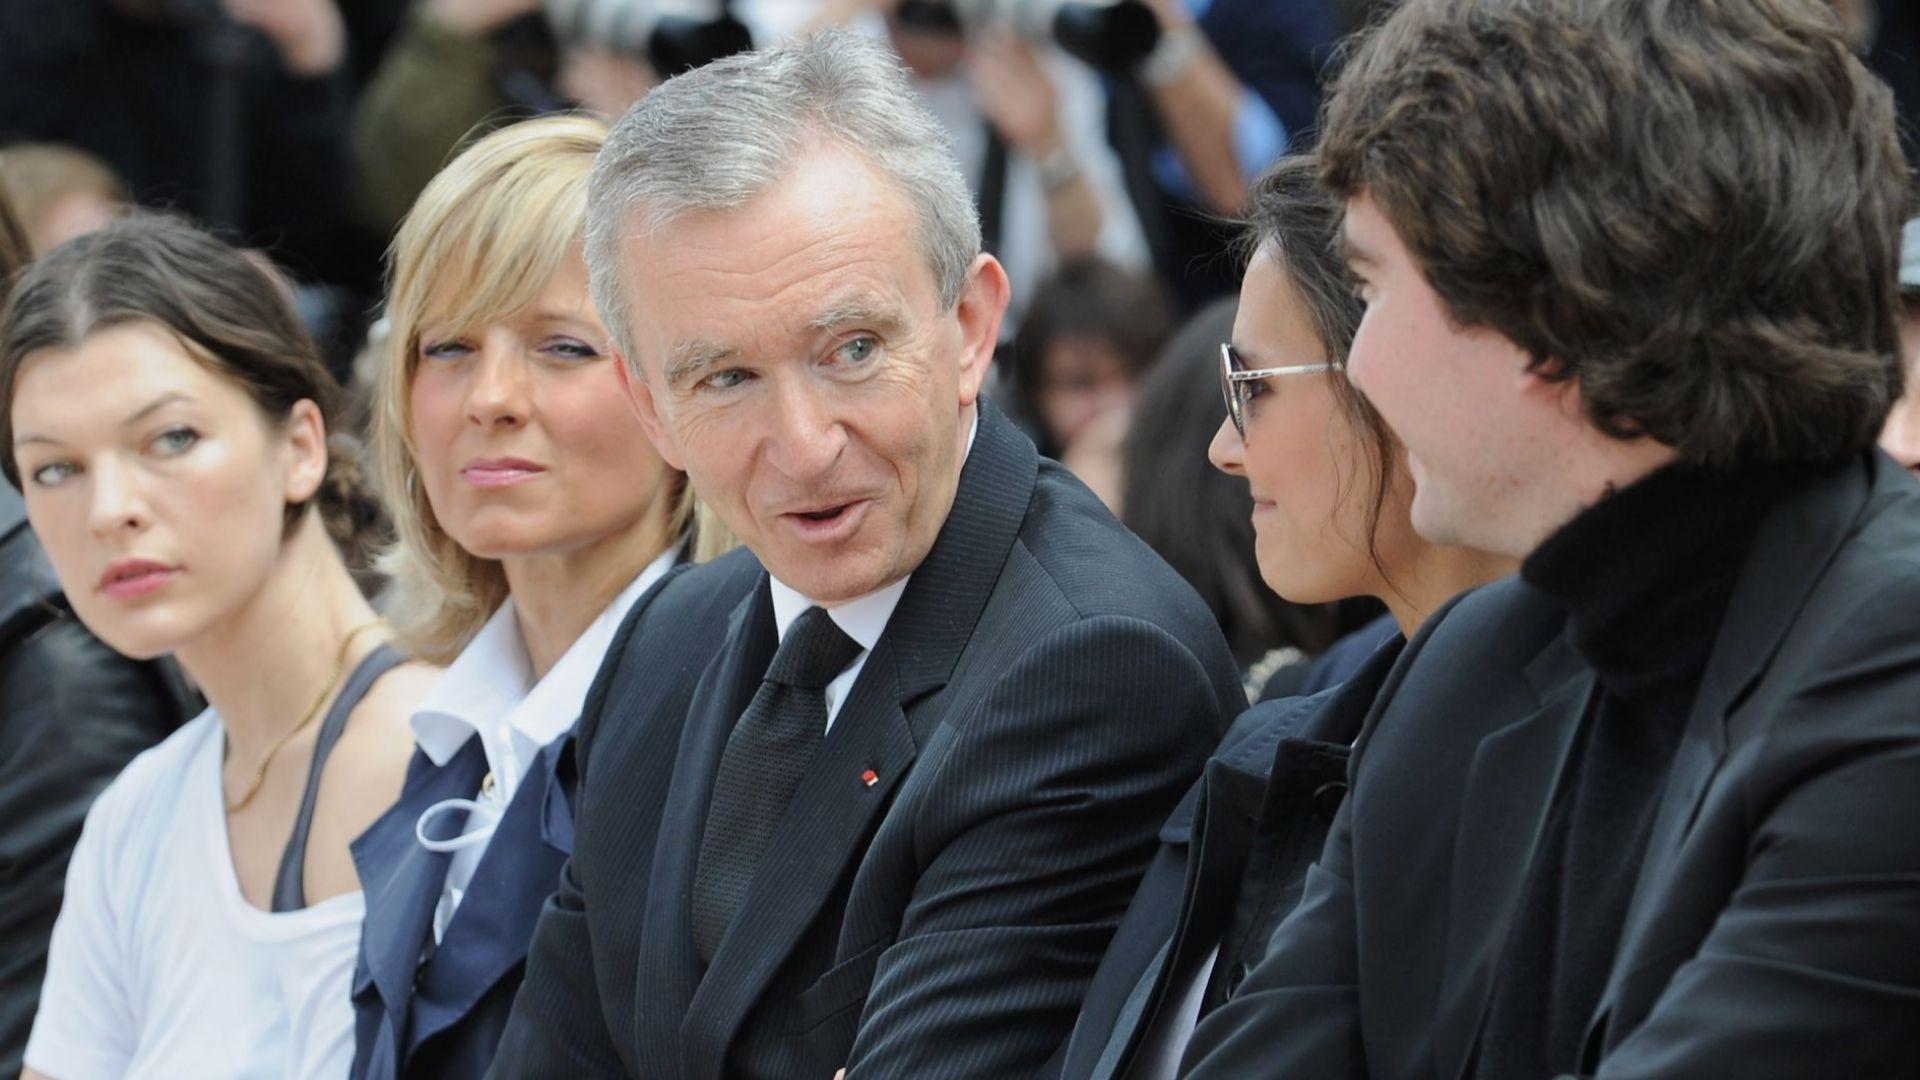 През 2017-а Бернар Арно придоби пълния контрол над Christian Dior срещу 12,10 млрд. евро